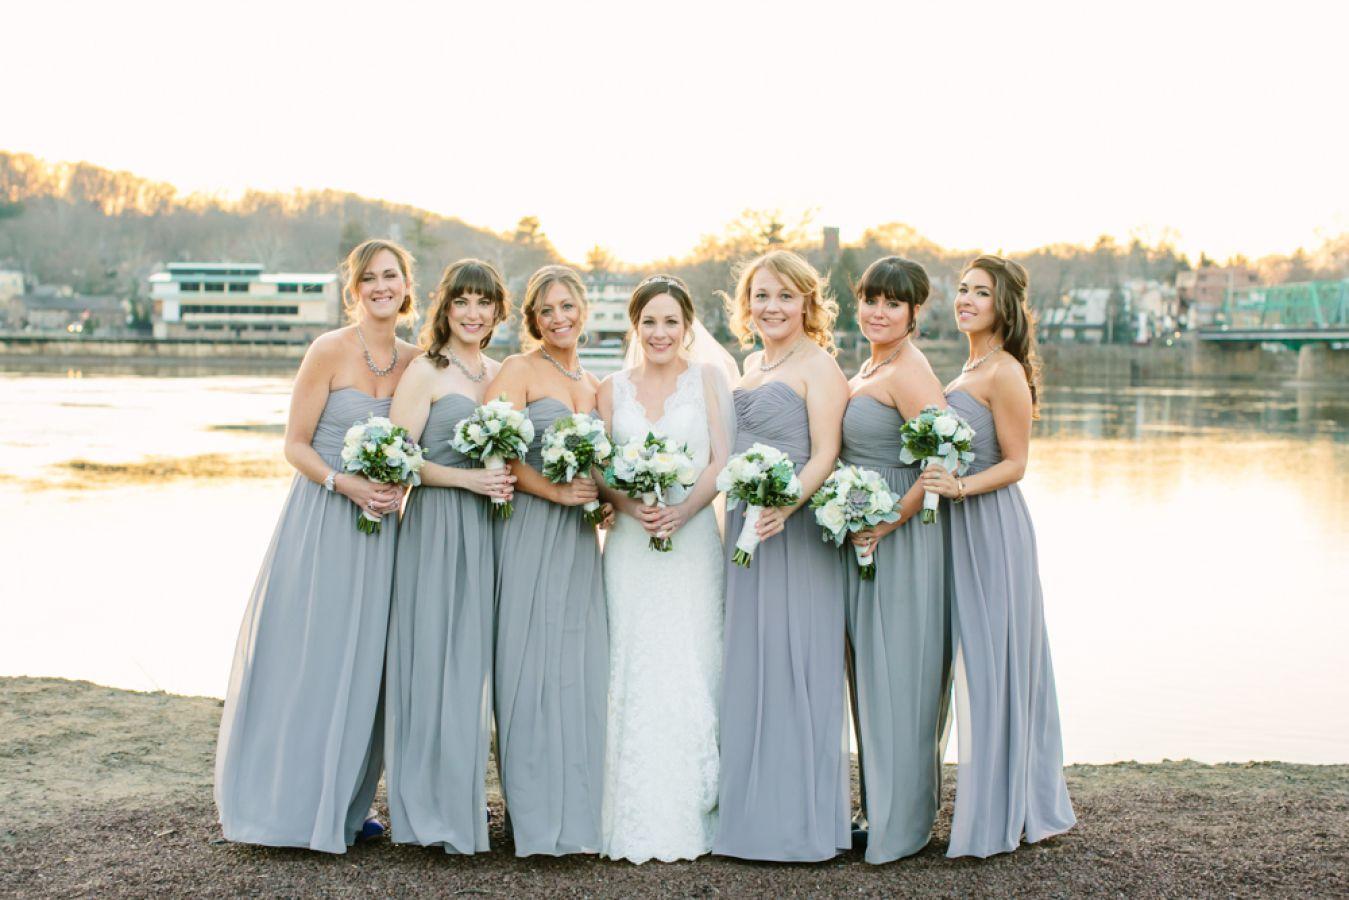 Kathleen corey new jersey wedding donna morgan collection kathleen corey new jersey wedding donna morgan collection bridesmaid ombrellifo Choice Image